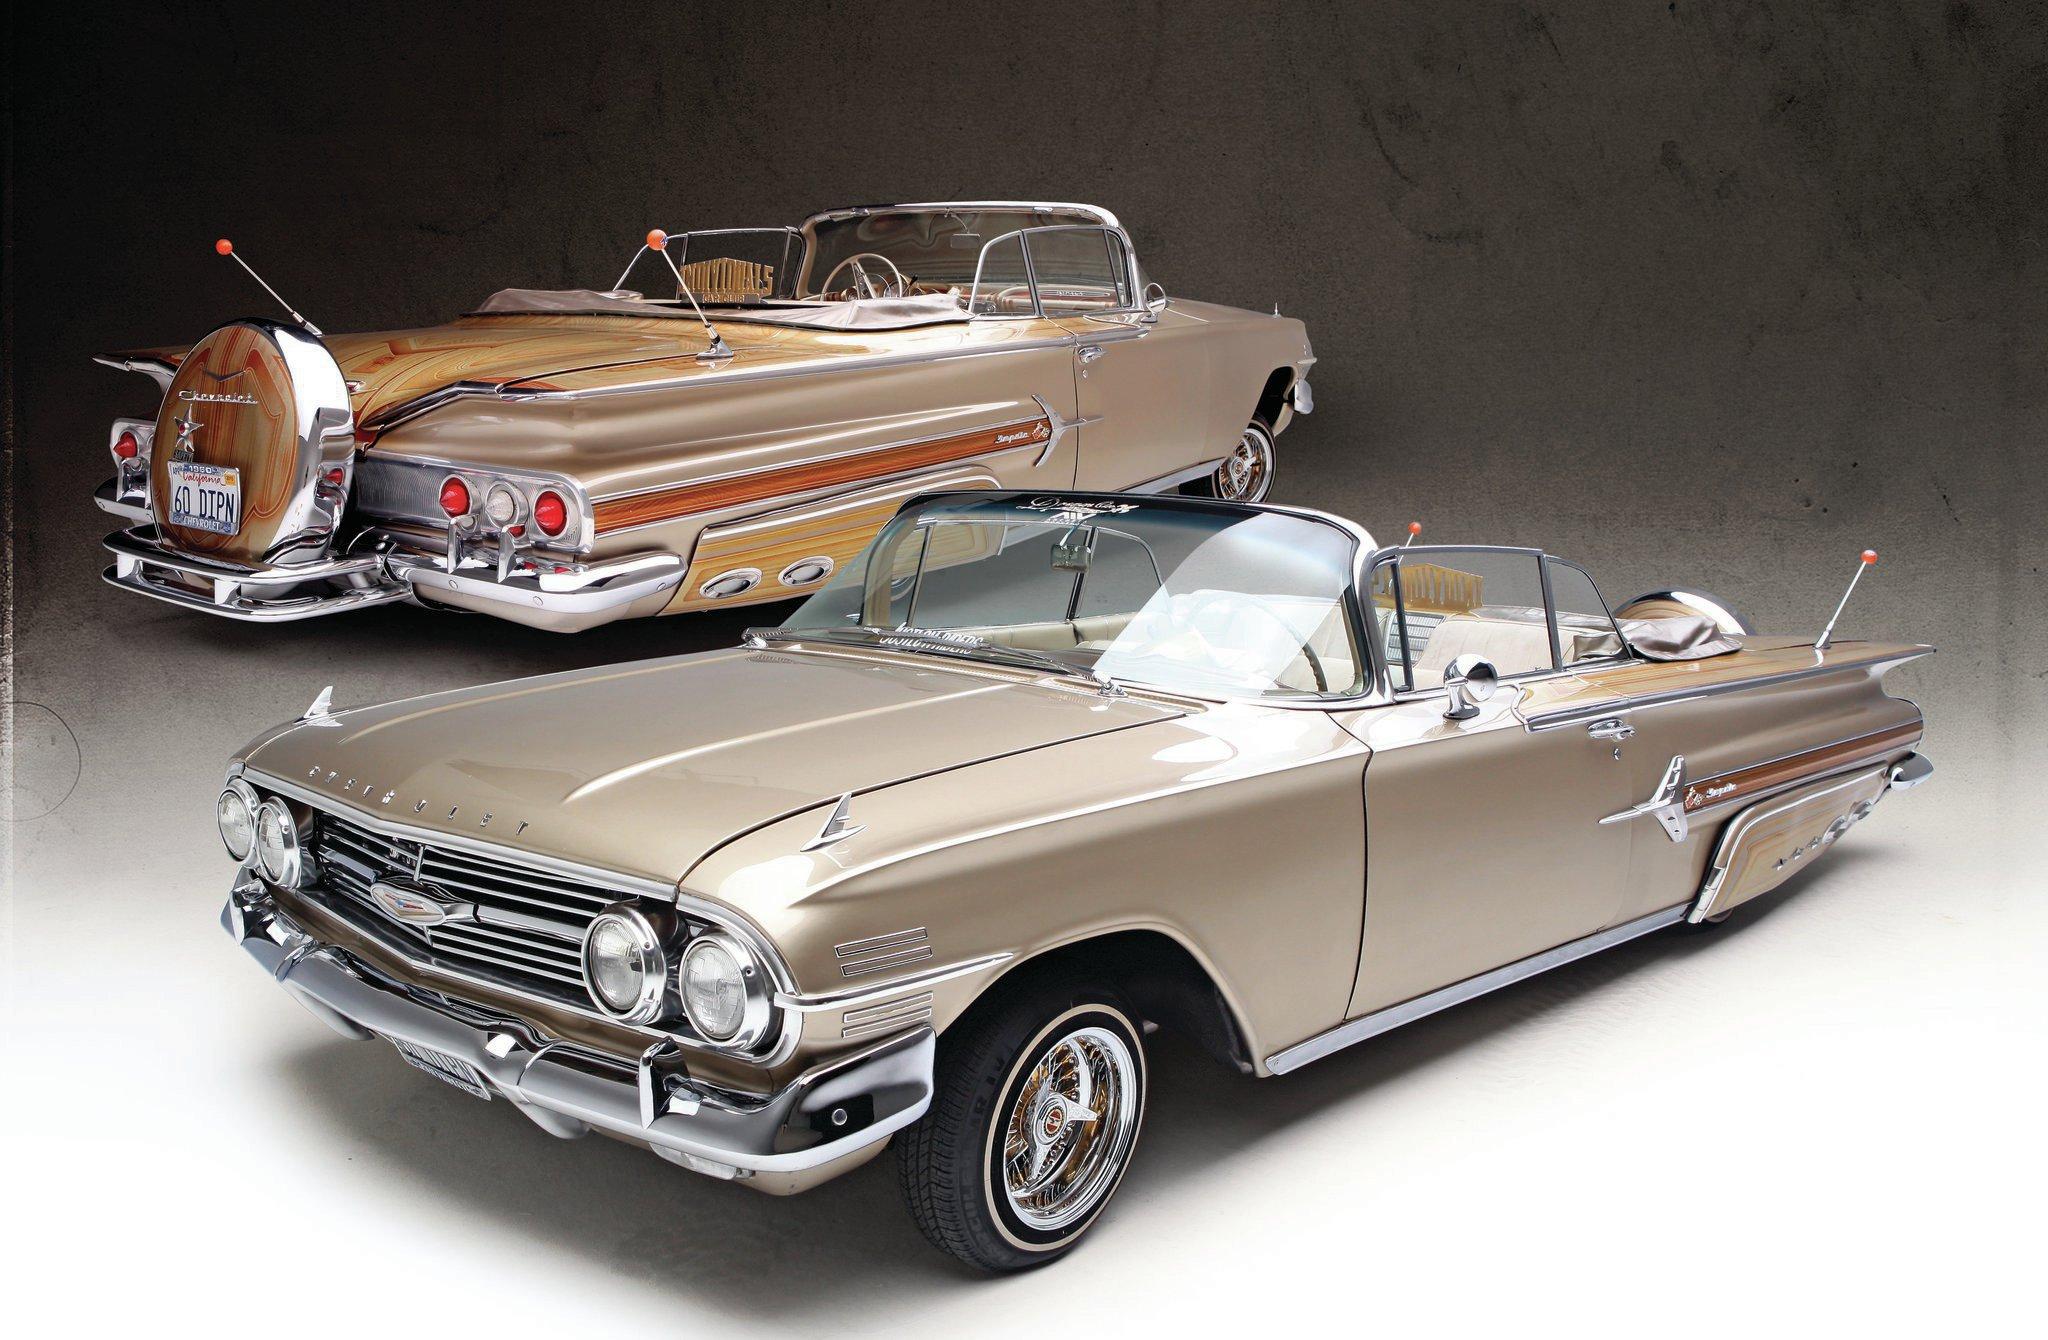 64 Impala Convertible >> 1960 Chevrolet Impala Convertible - One Lucky Individual